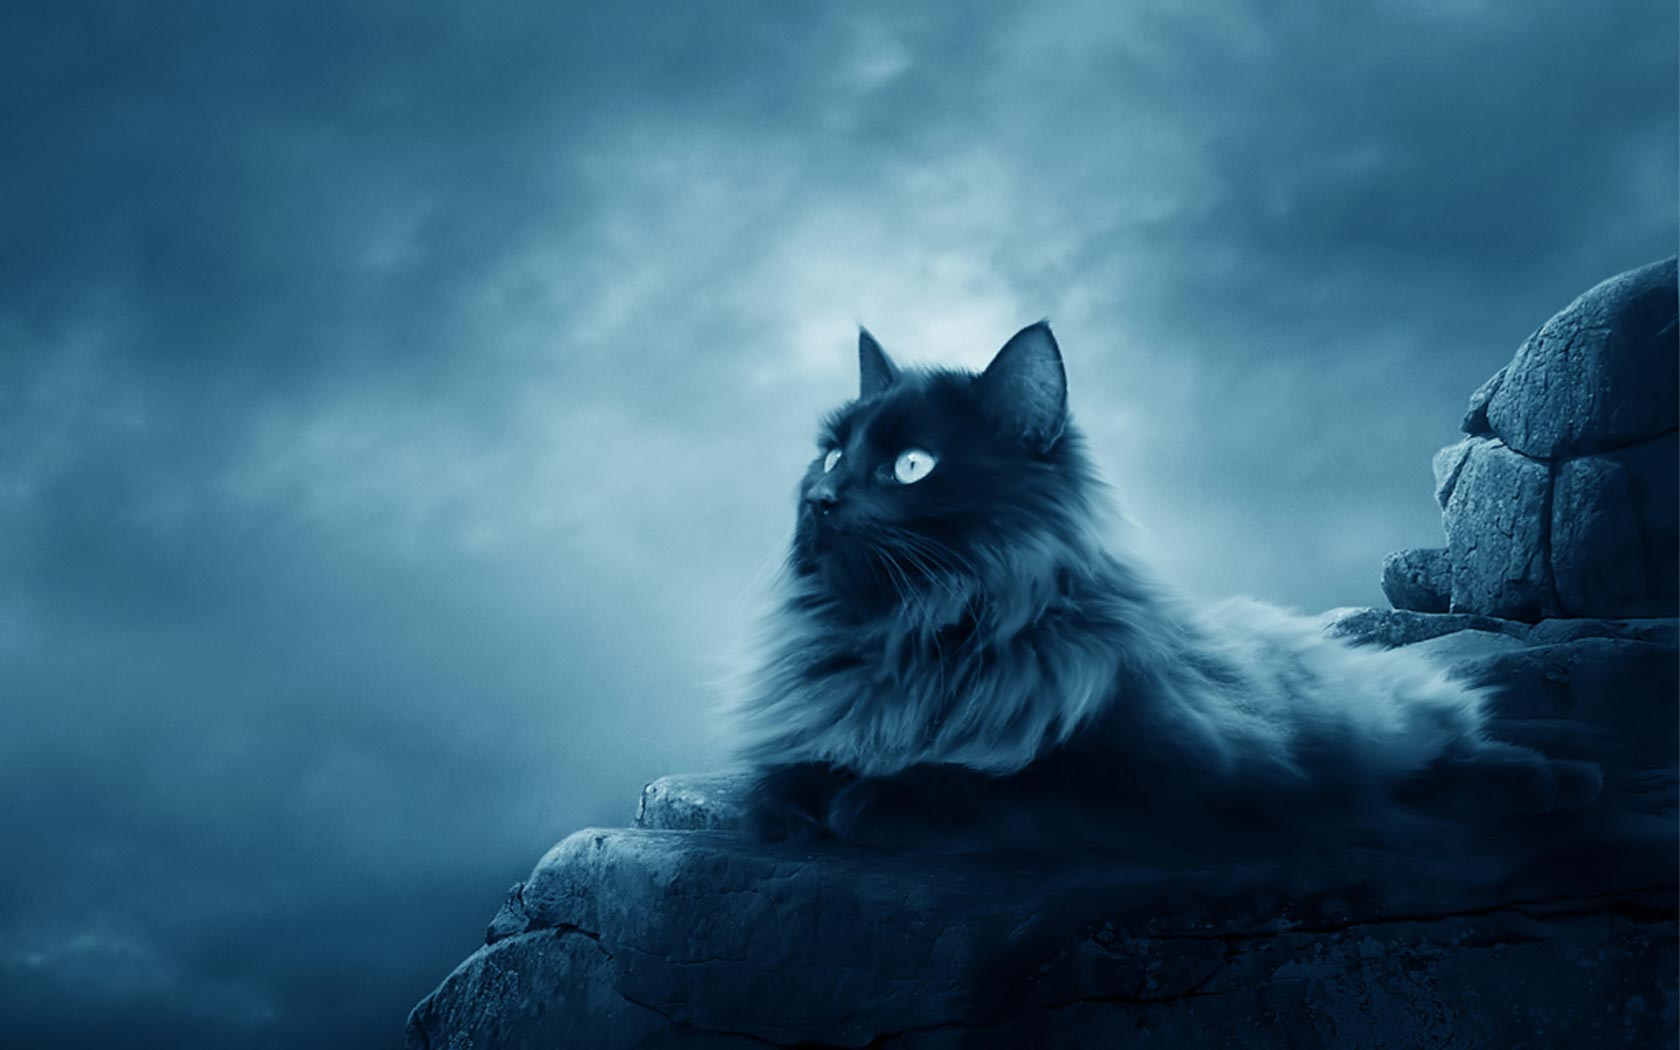 Animalia - Gatto  Sfondi